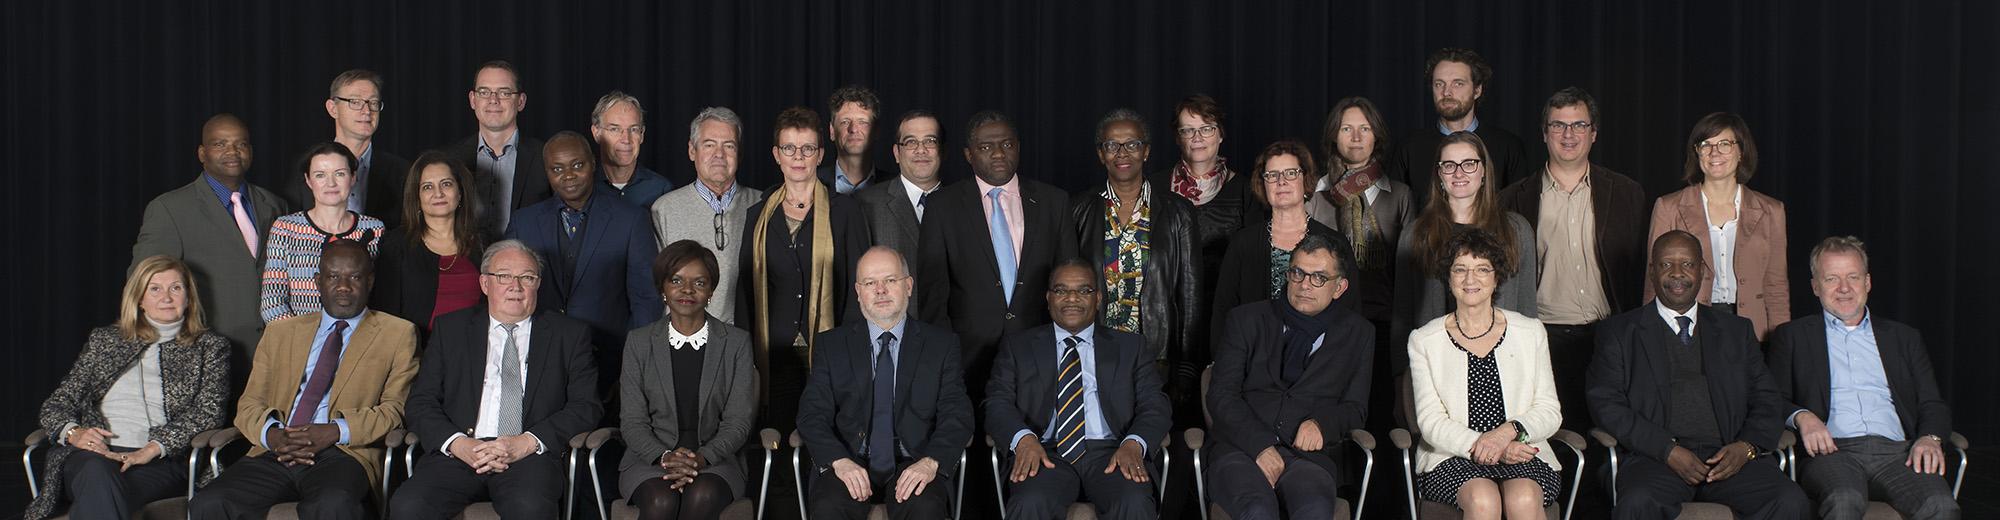 EDCTP General Assembly November 2017